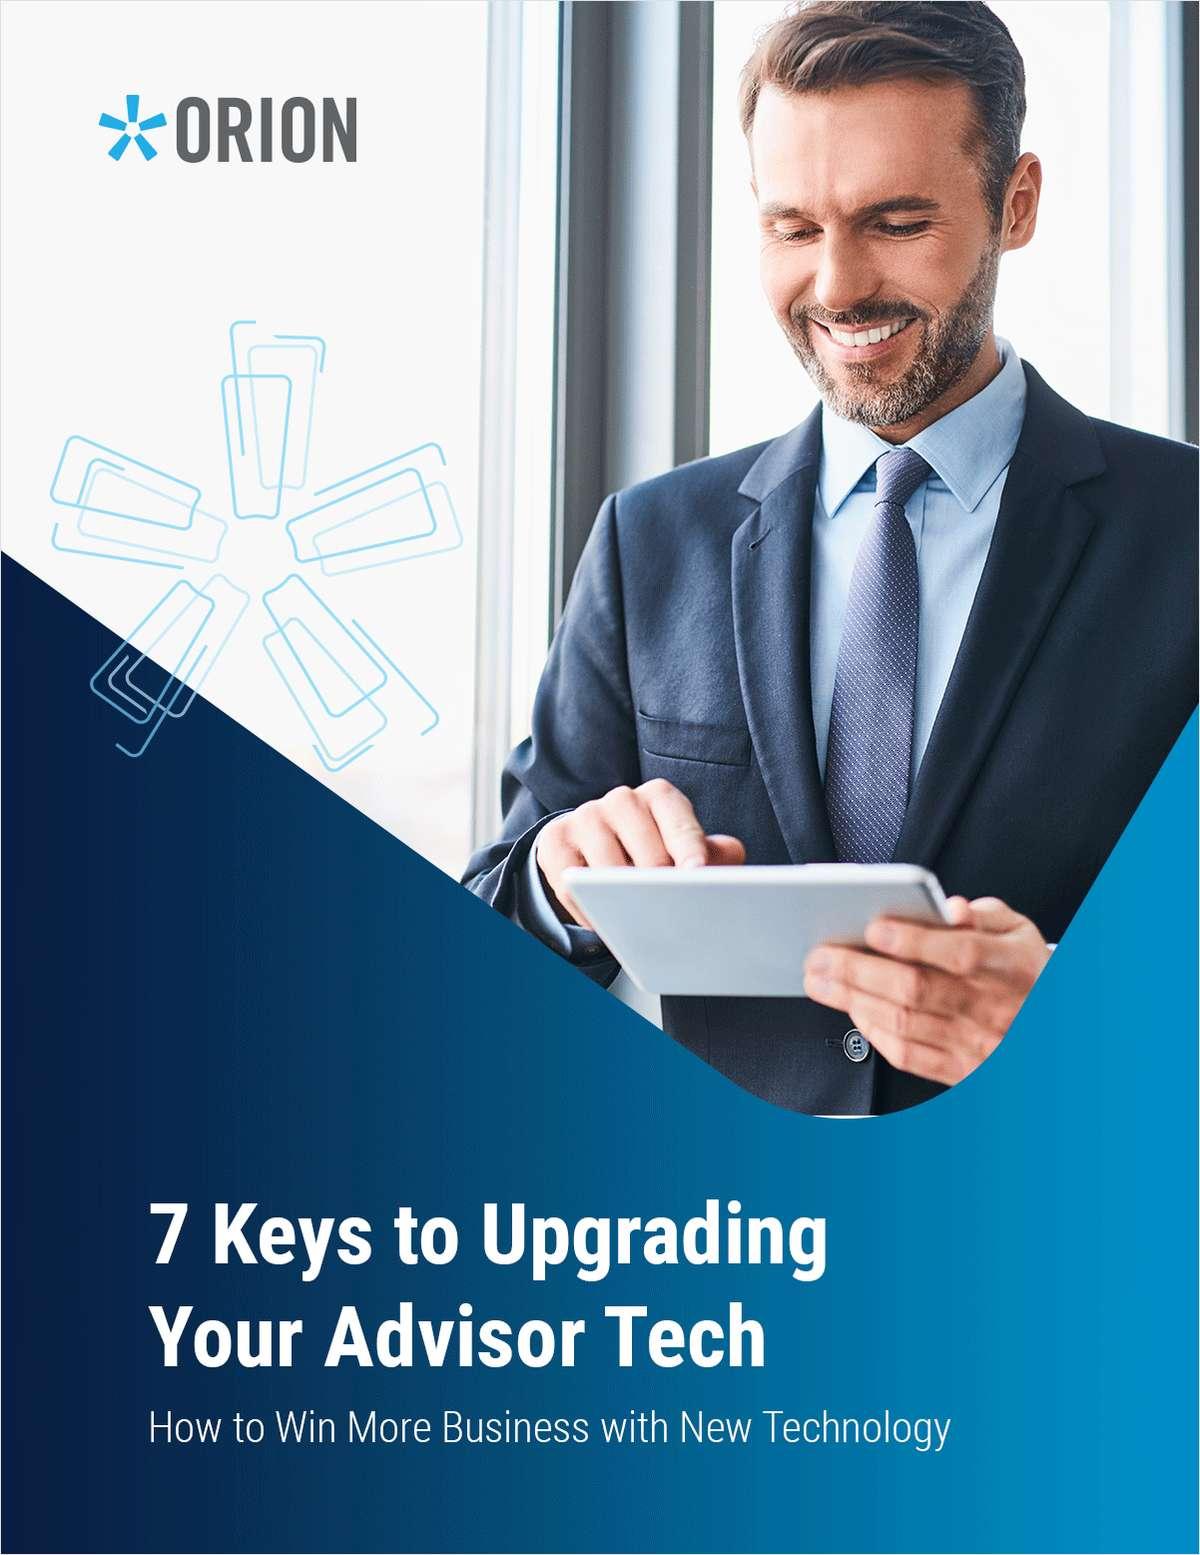 7 Keys to Upgrading Your Advisor Tech